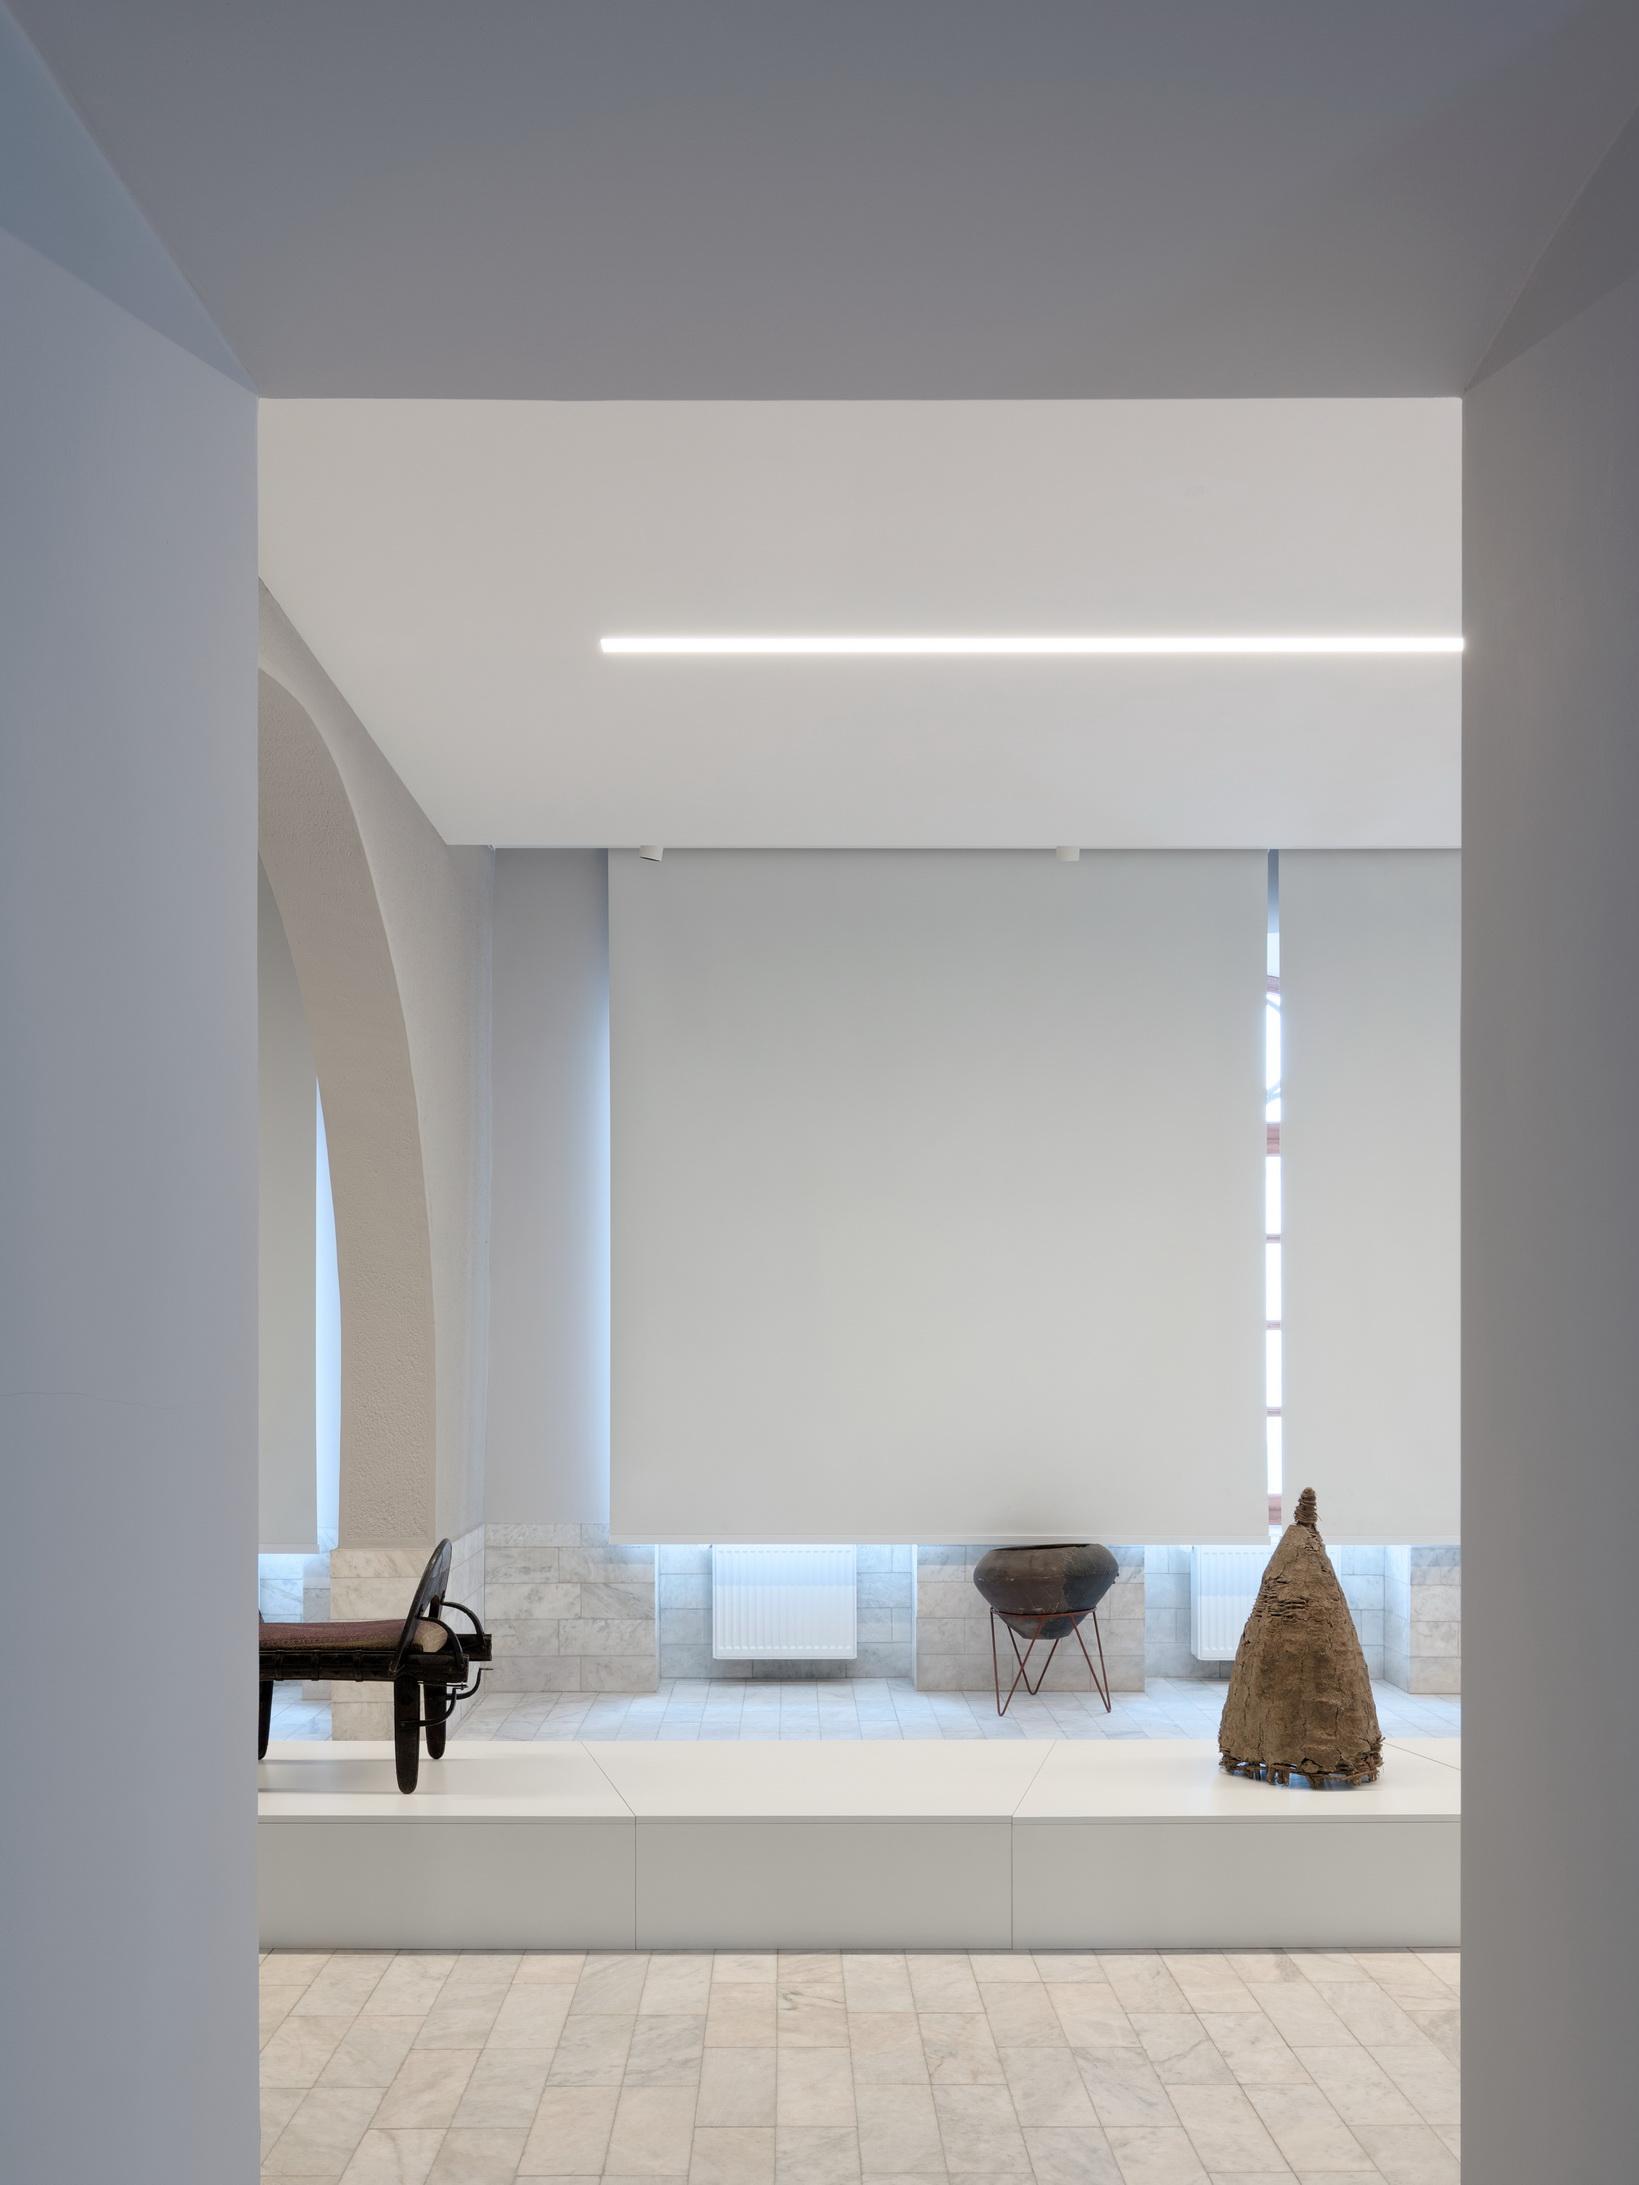 Aleksandar_Gušić_Architecture_-_Narodni_Muzej_Smederevska_Palanka_4_resize